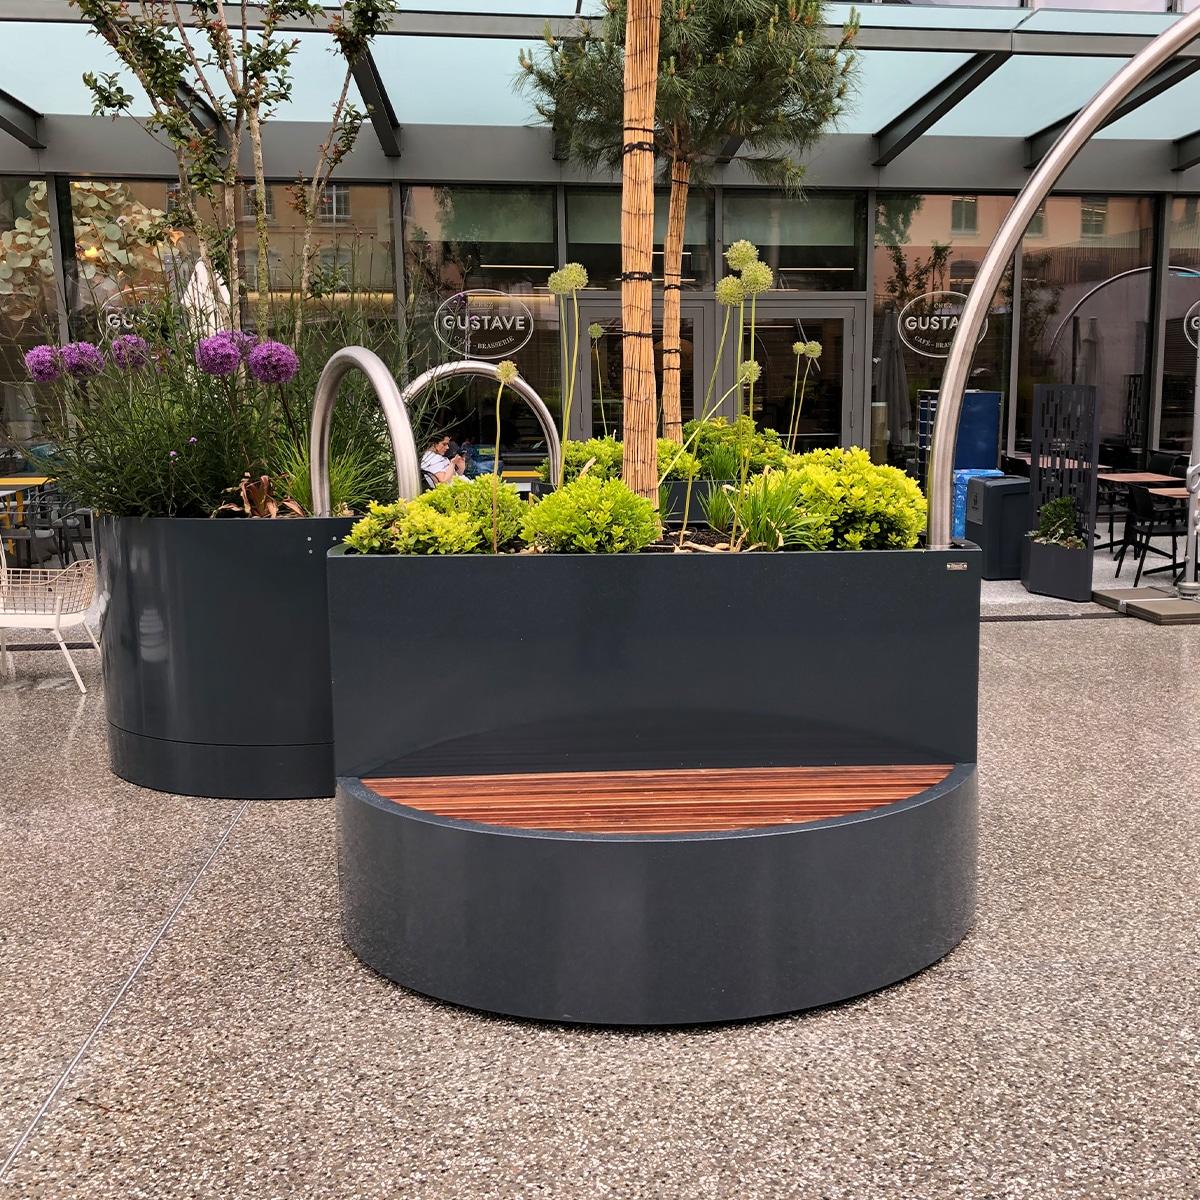 ATECH-bespoke-urban-garden-plants